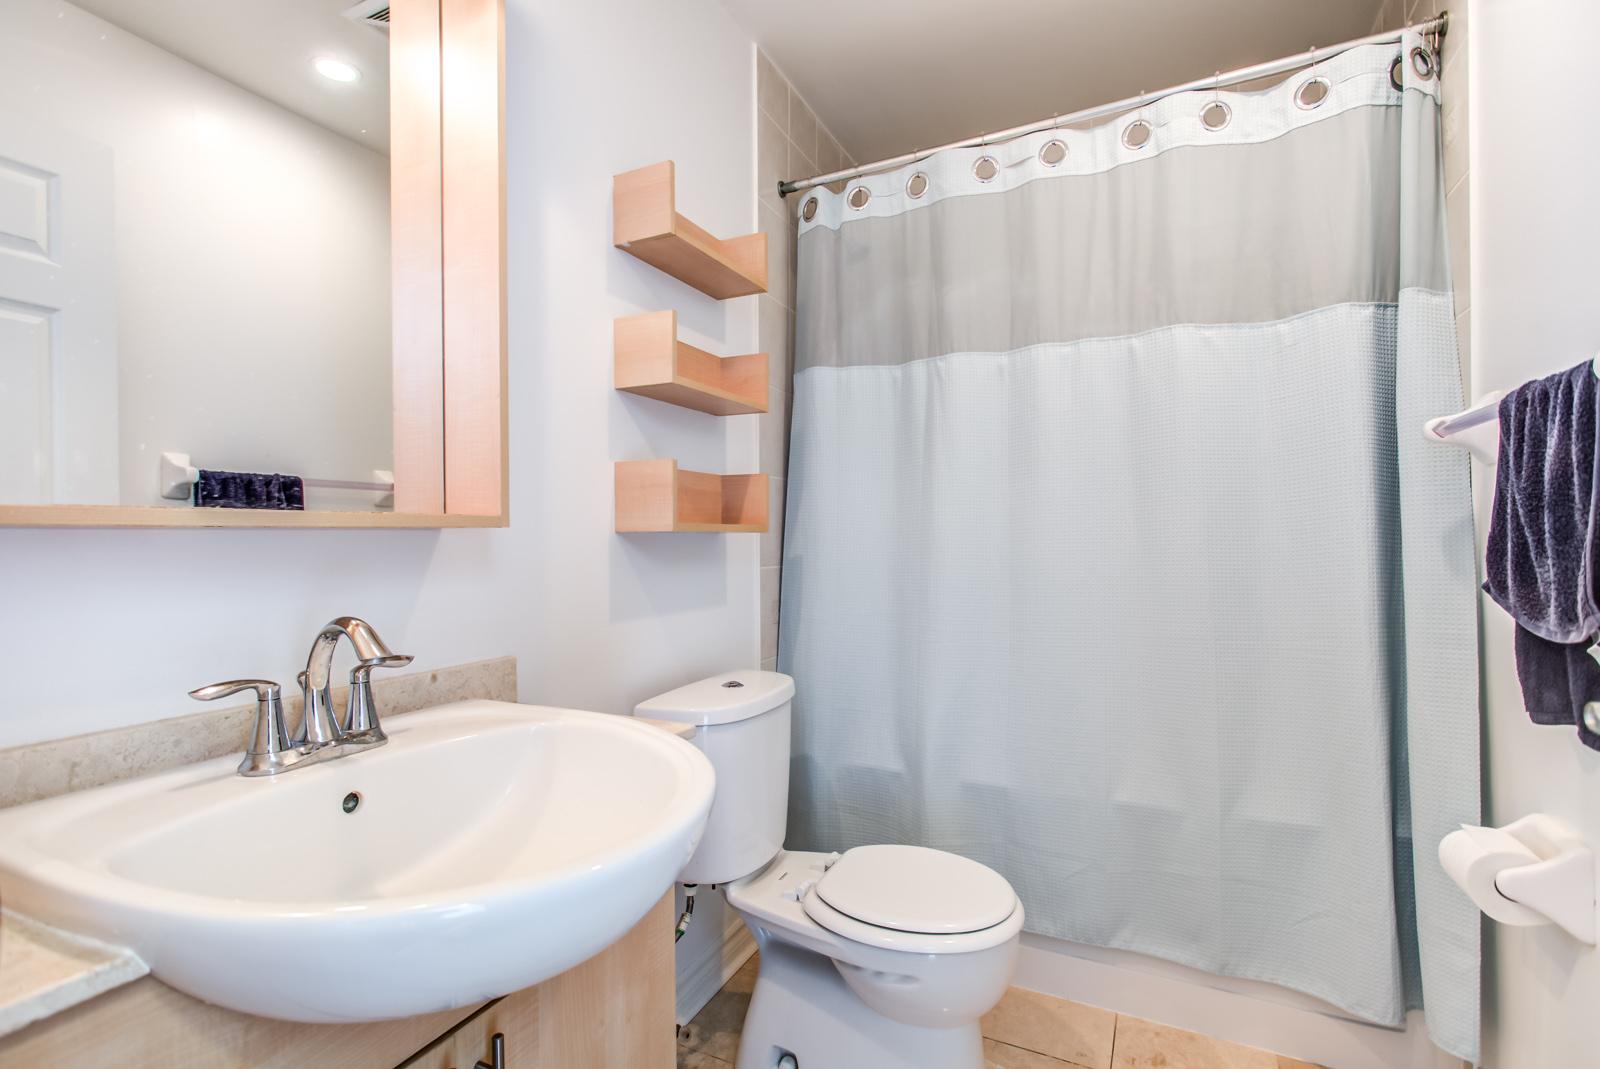 Unit 901 bathroom looking so beautiful and elegant.